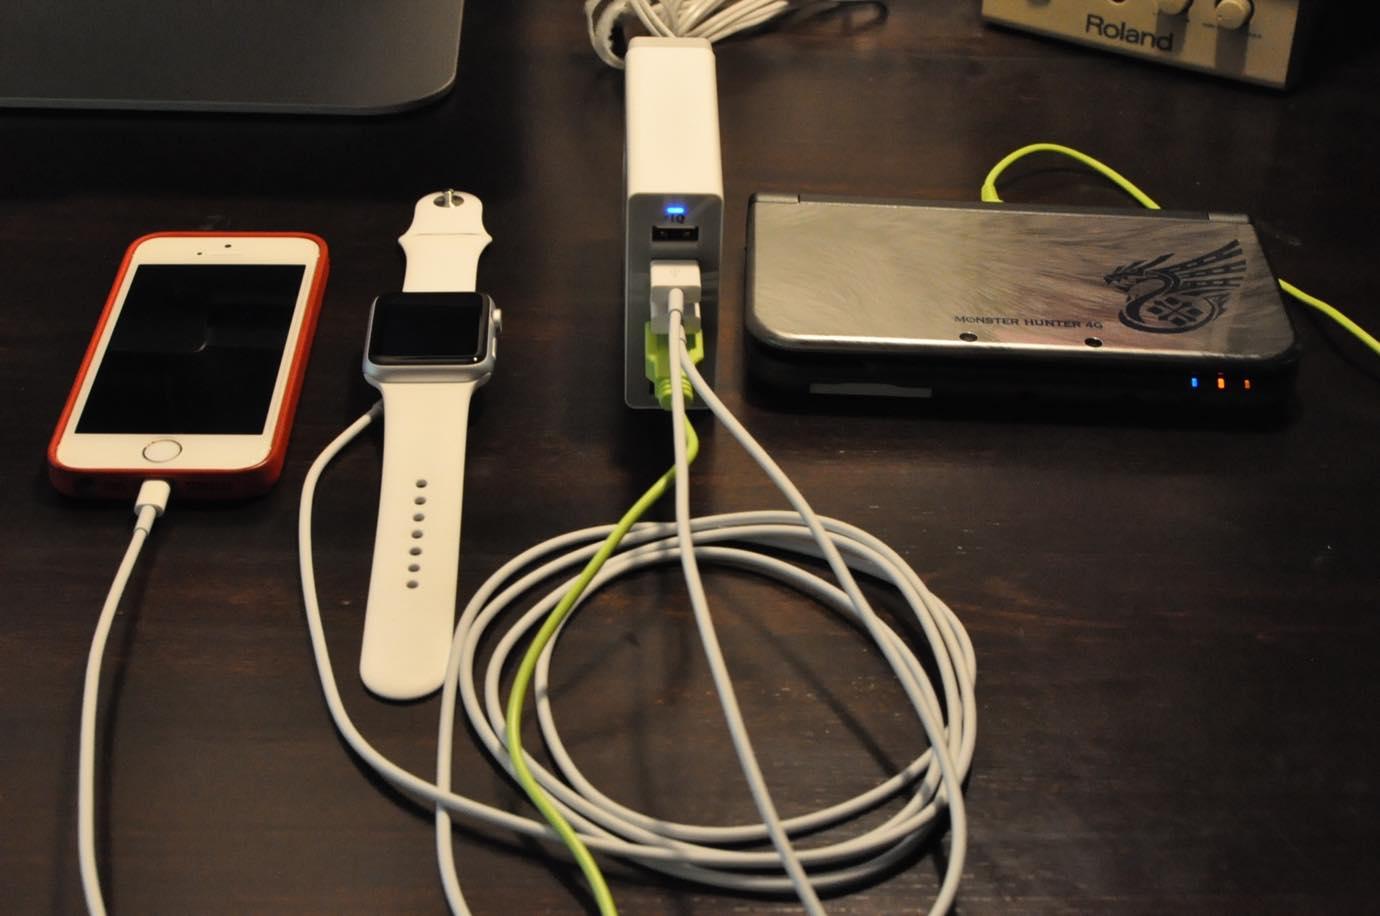 Anker 60W 6ポート USB急速充電器 14 20150808 135911